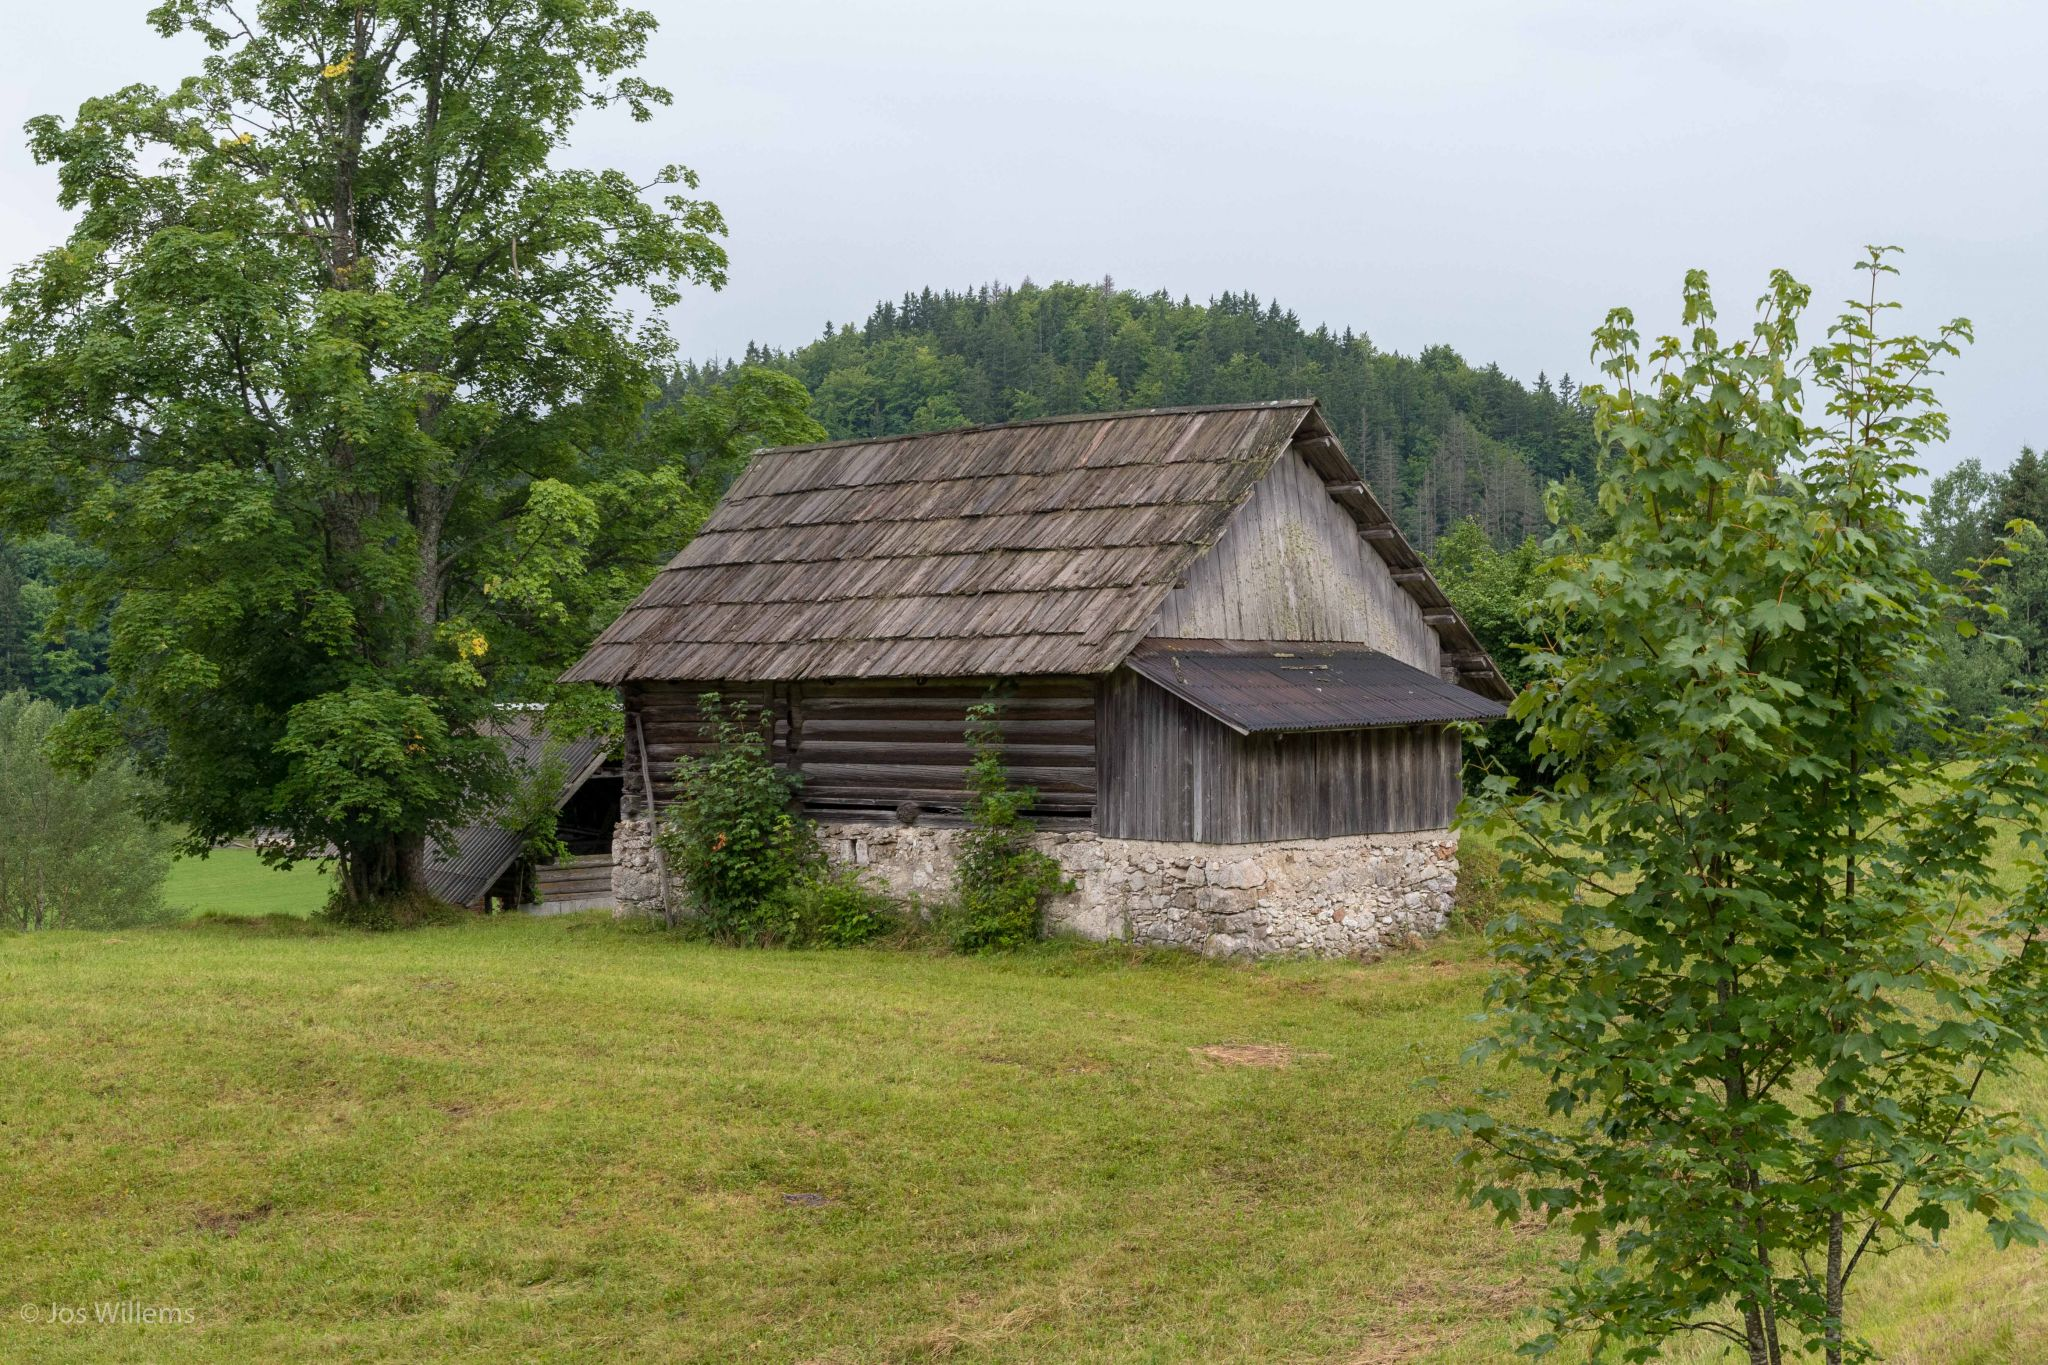 Koprivnik v Bohinju at the Pokljuka Plateau, Slovenia